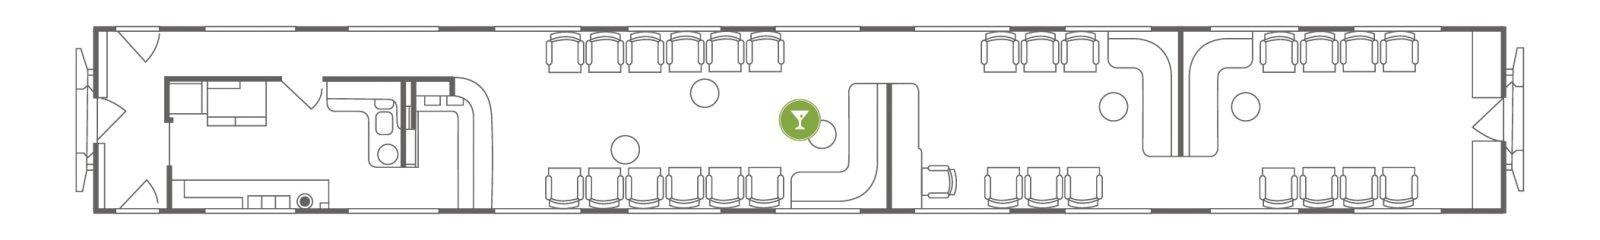 Compartments-04